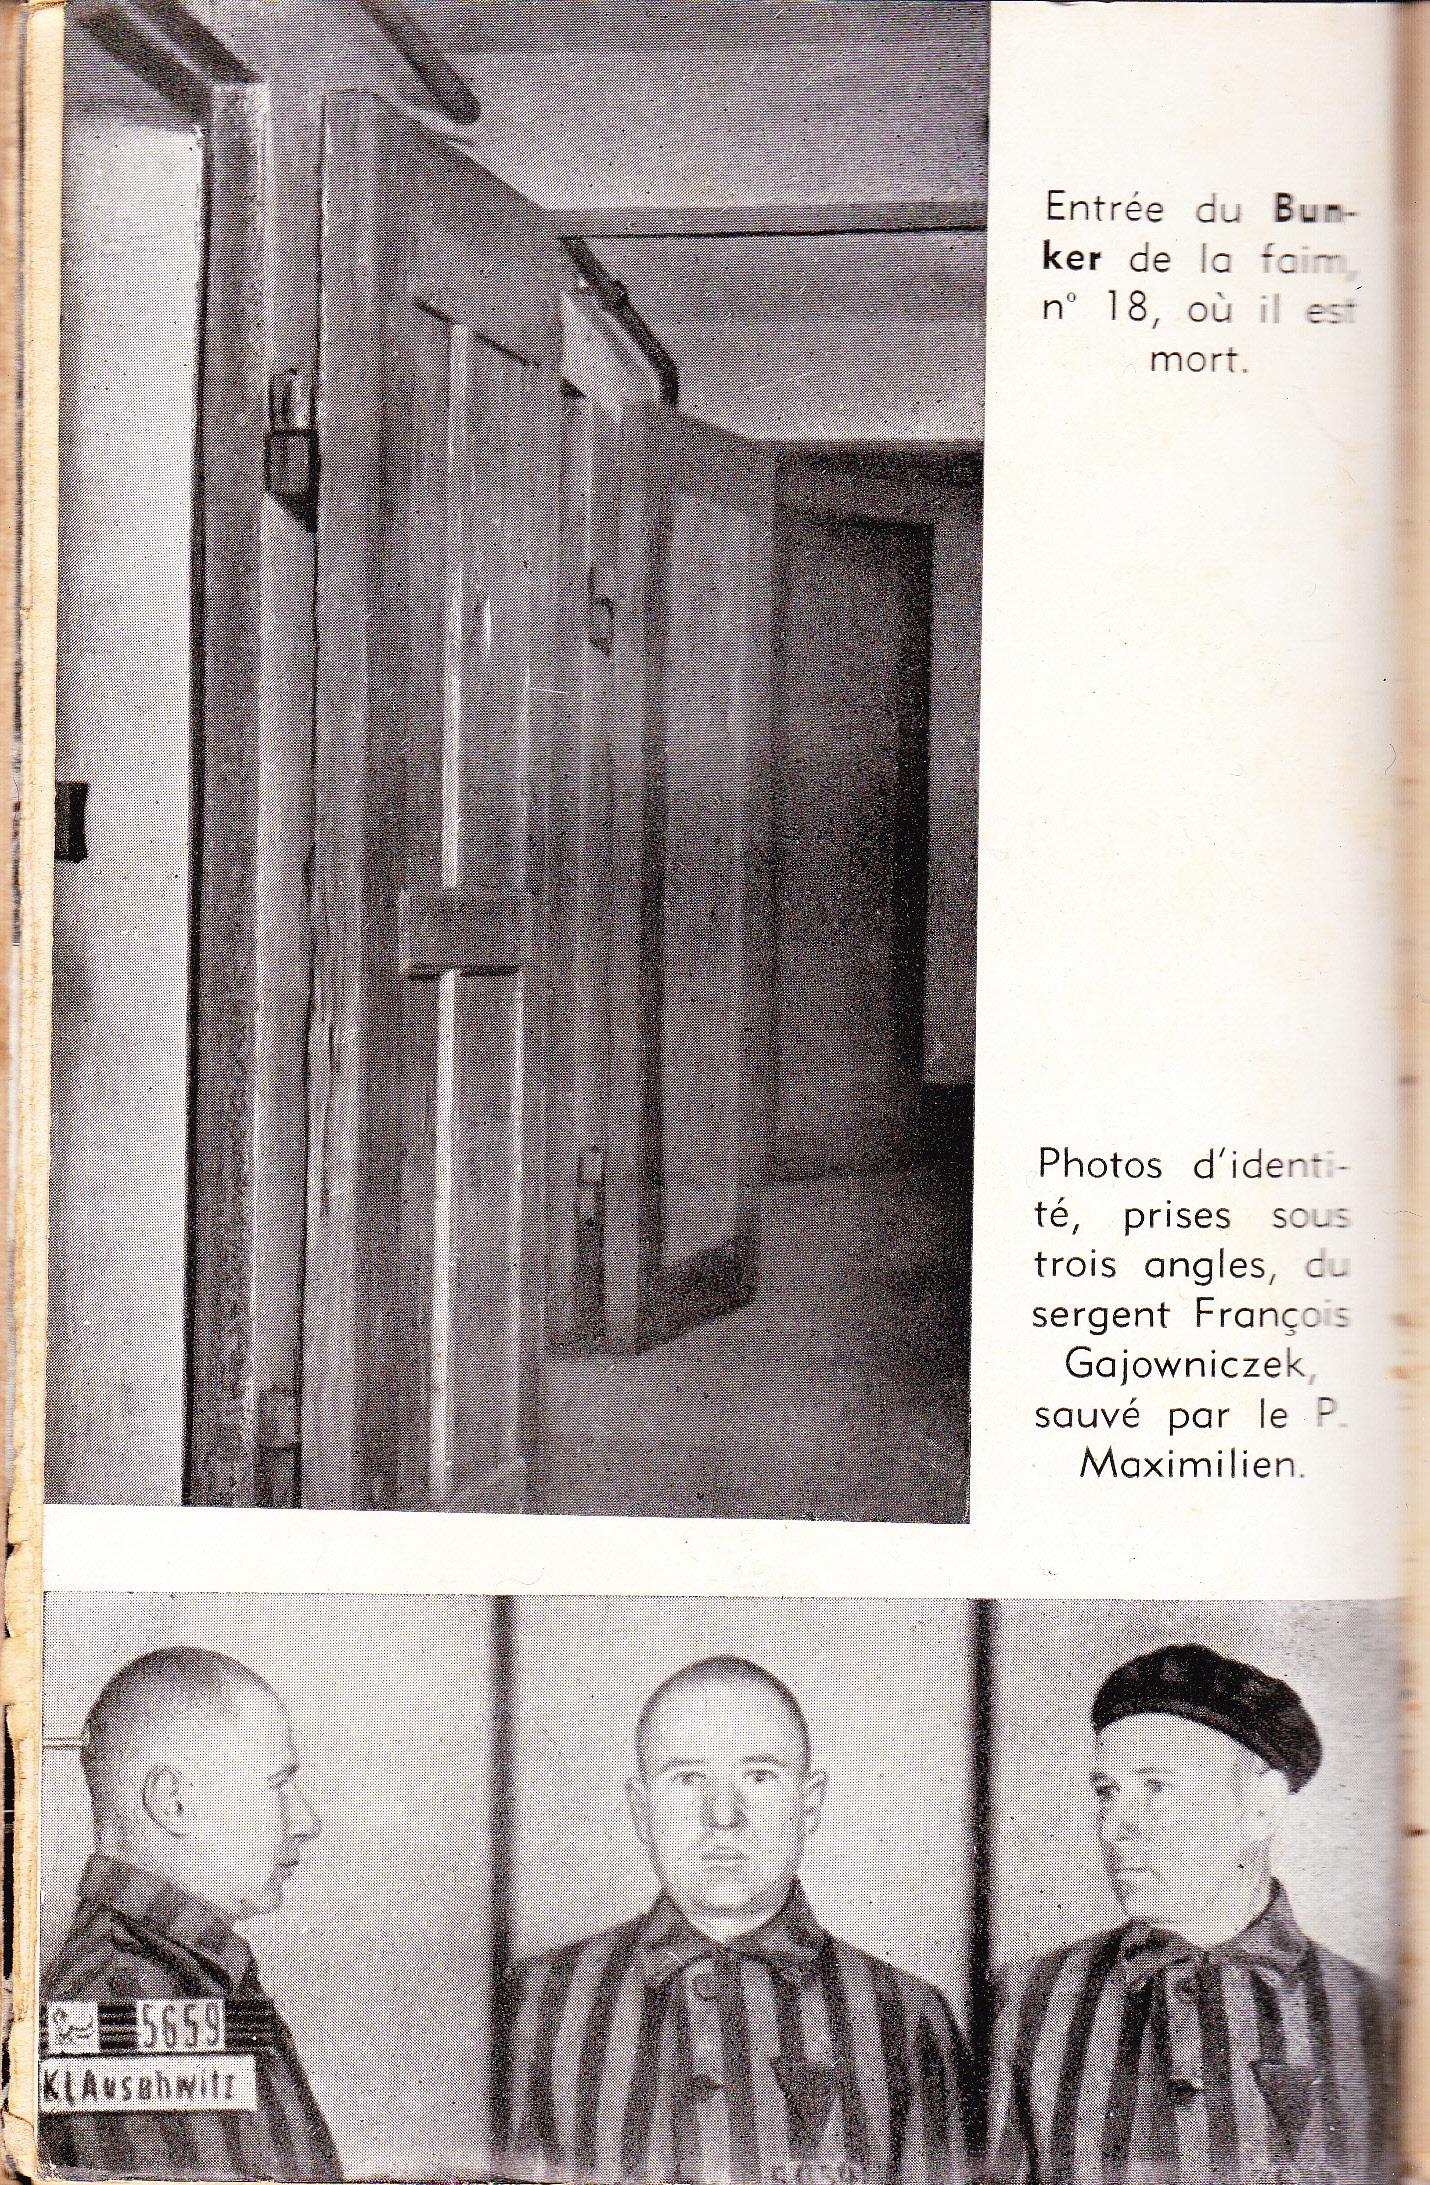 martyr pologne saint maximilien marie kolbe lepapillondeslivrescerclerenevigo. Black Bedroom Furniture Sets. Home Design Ideas